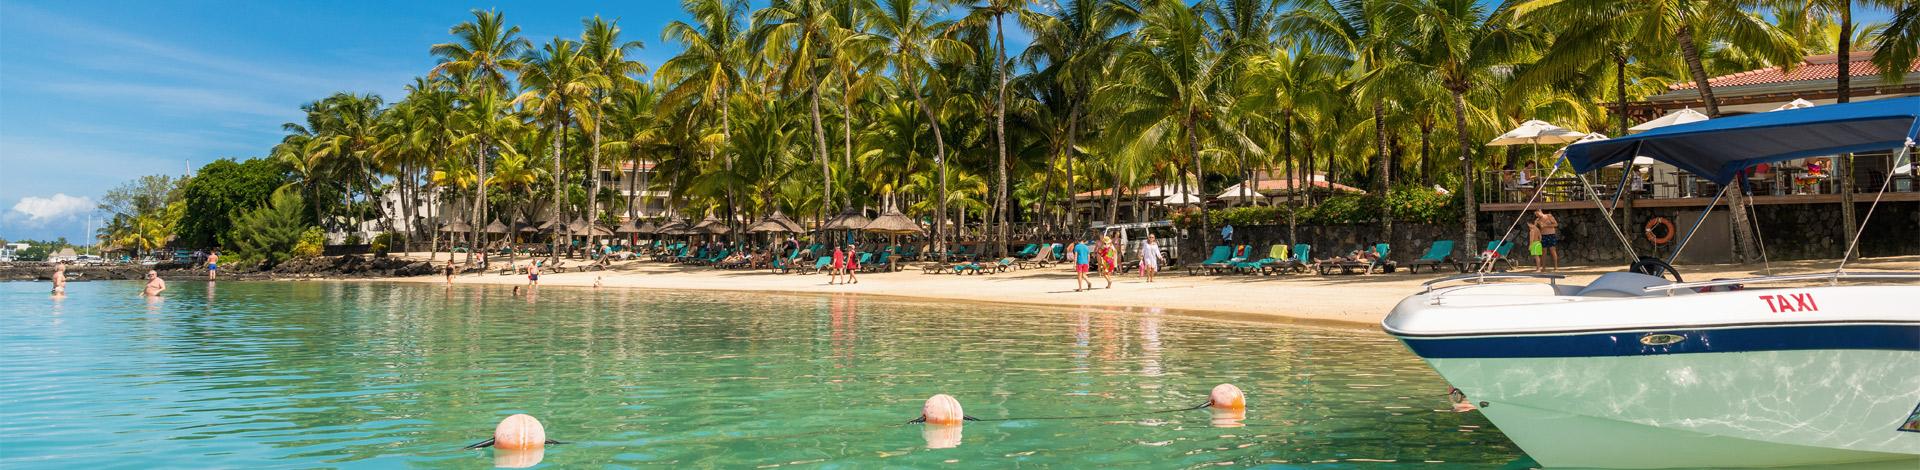 slider image mauricia beachcomber highlights